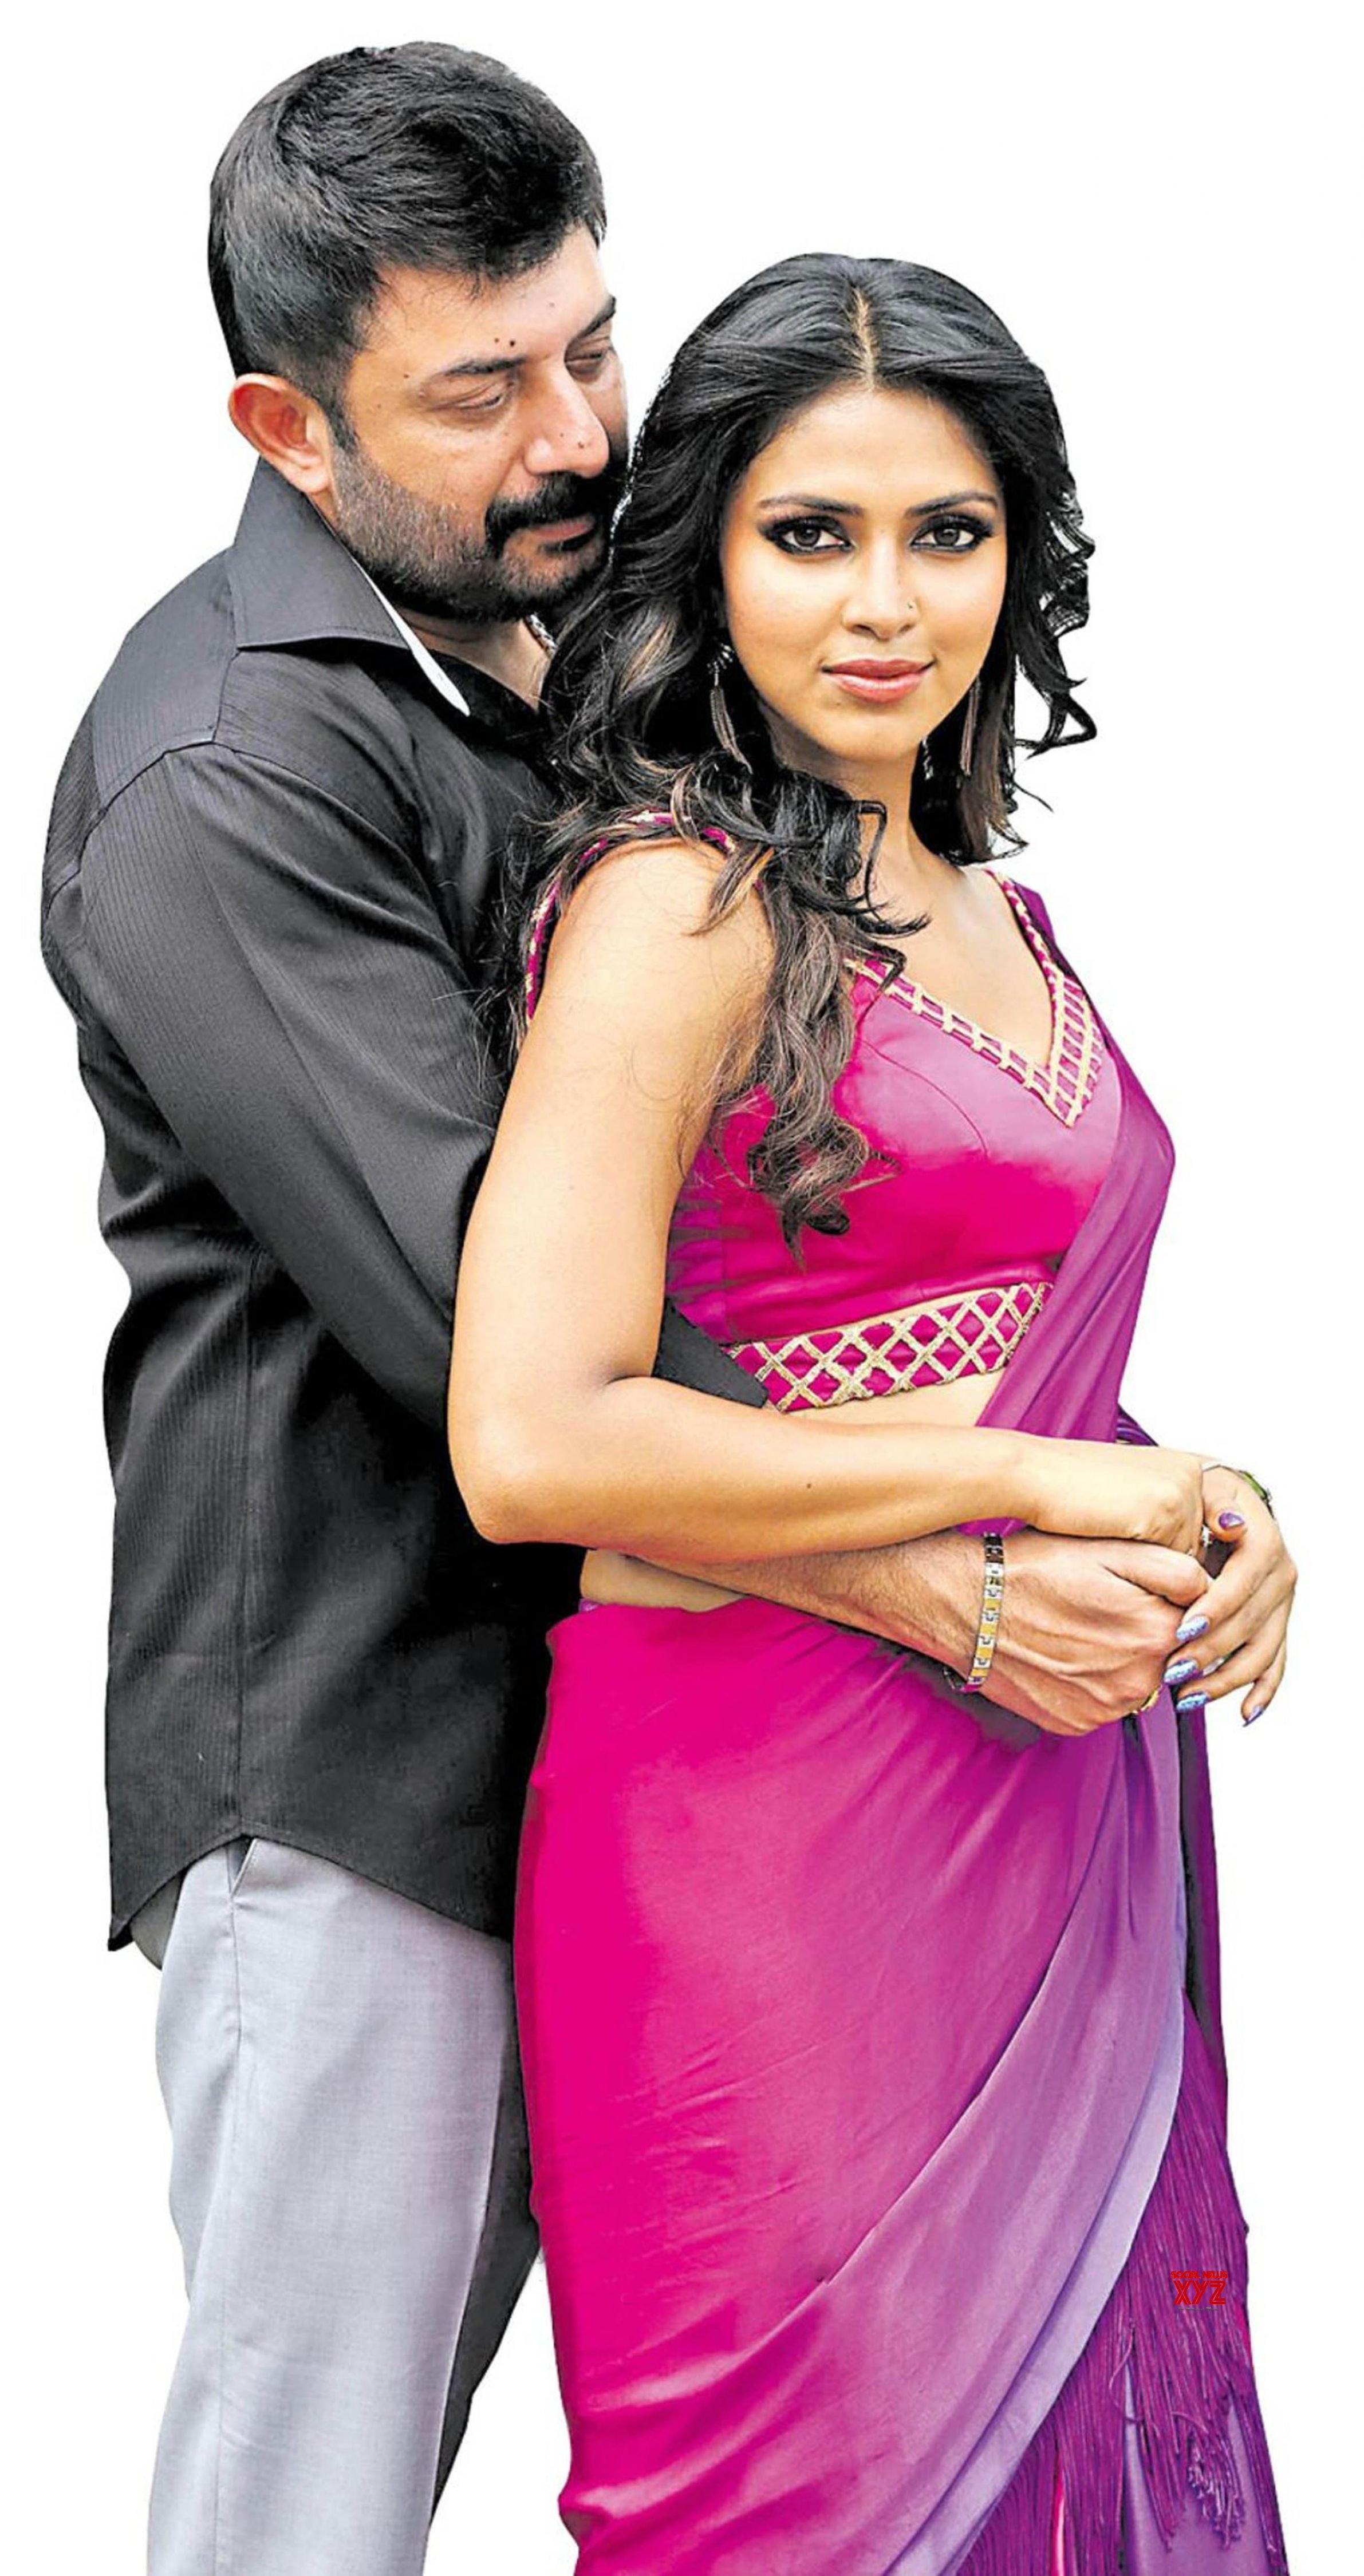 dating bhaskar wot t49 matchmaking